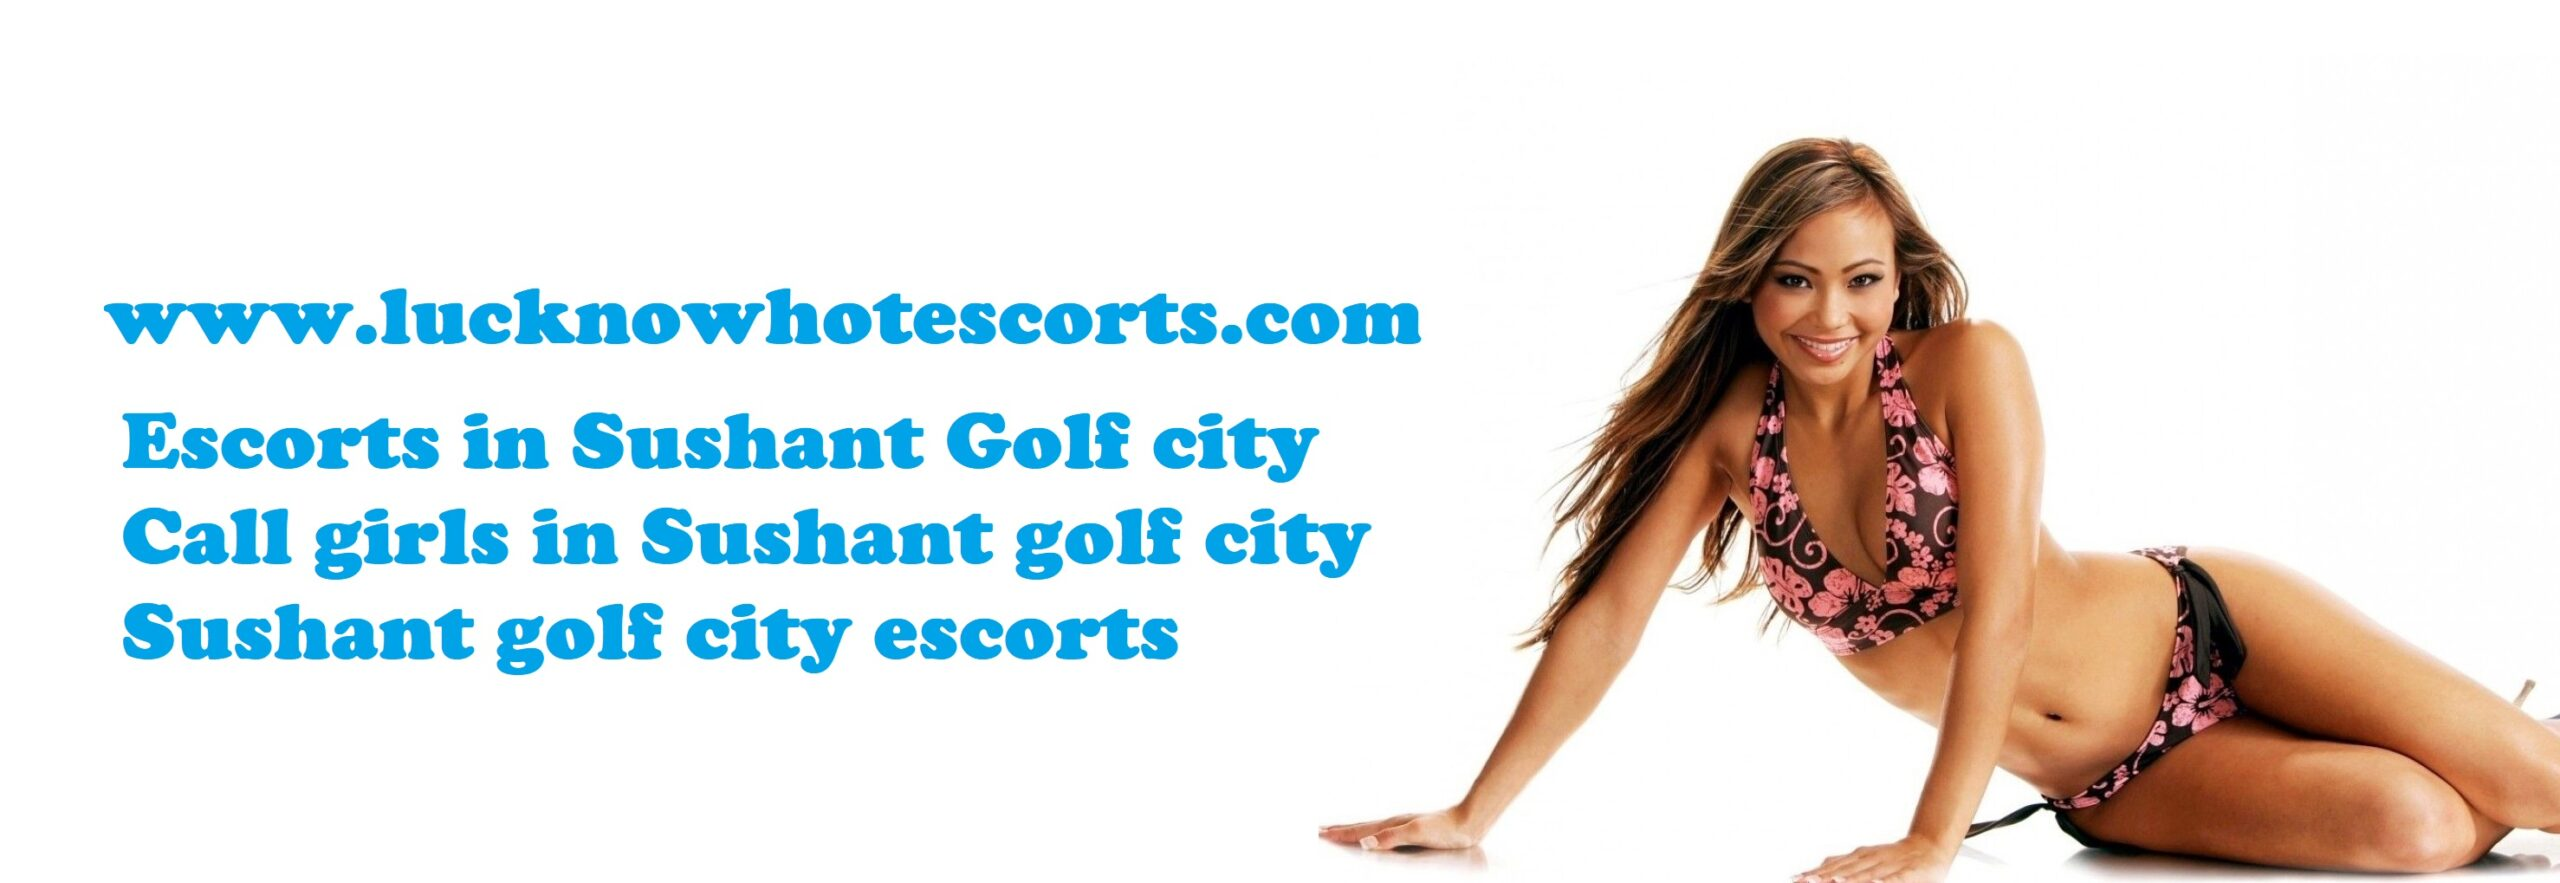 Sushant Golf city